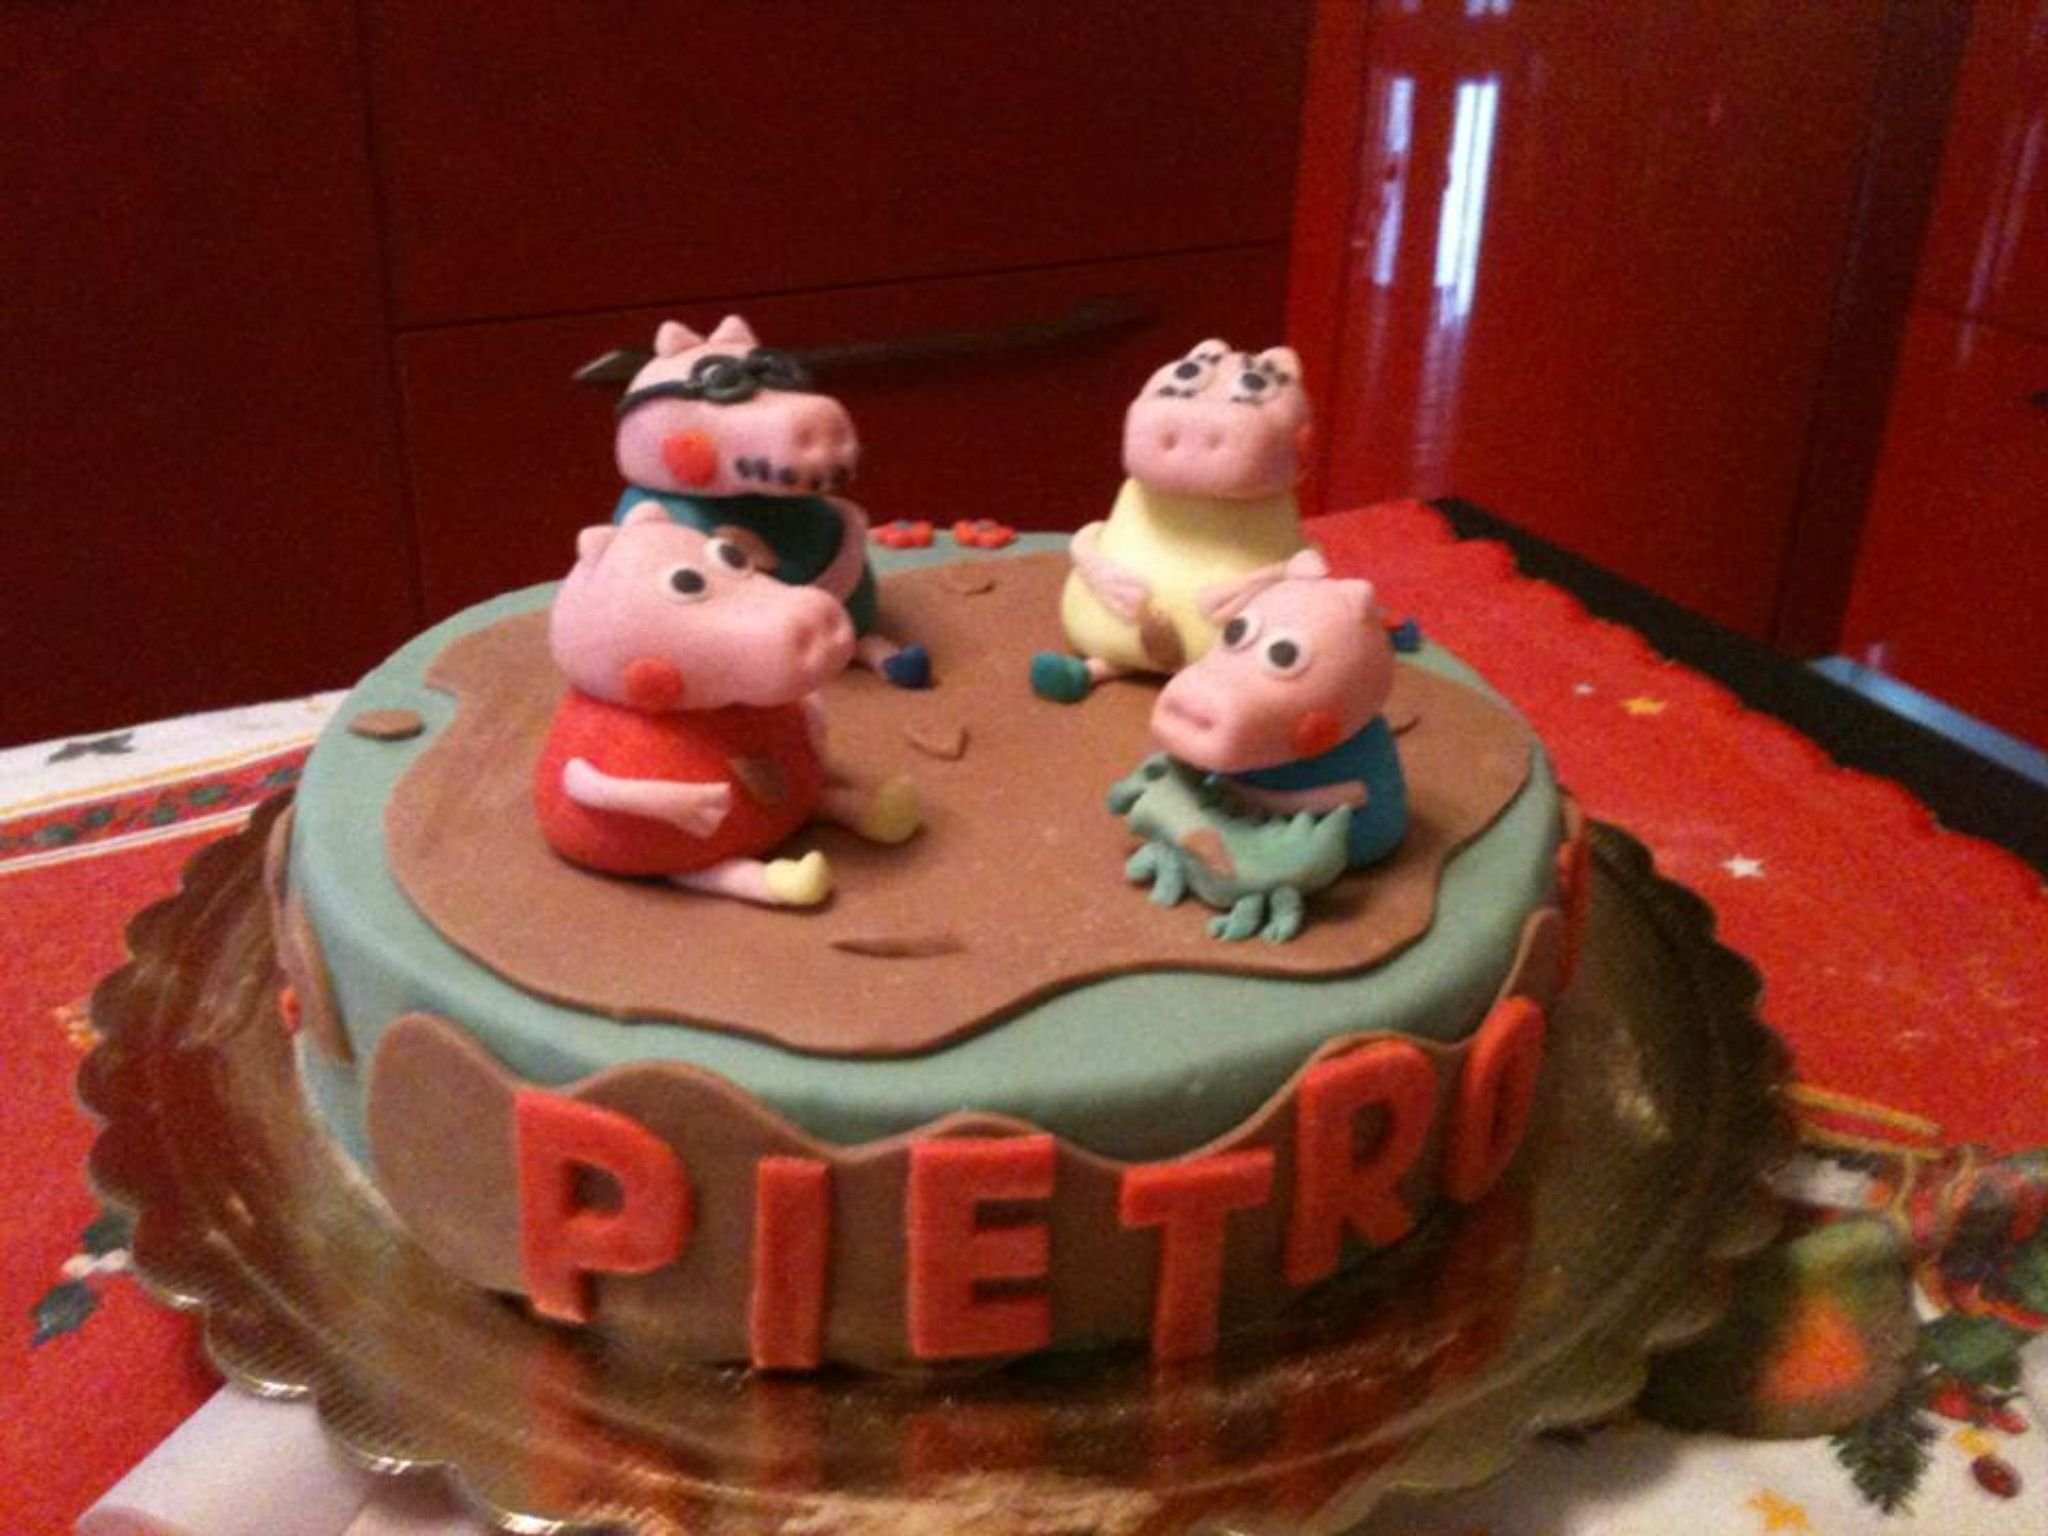 Peppa pig cake _2